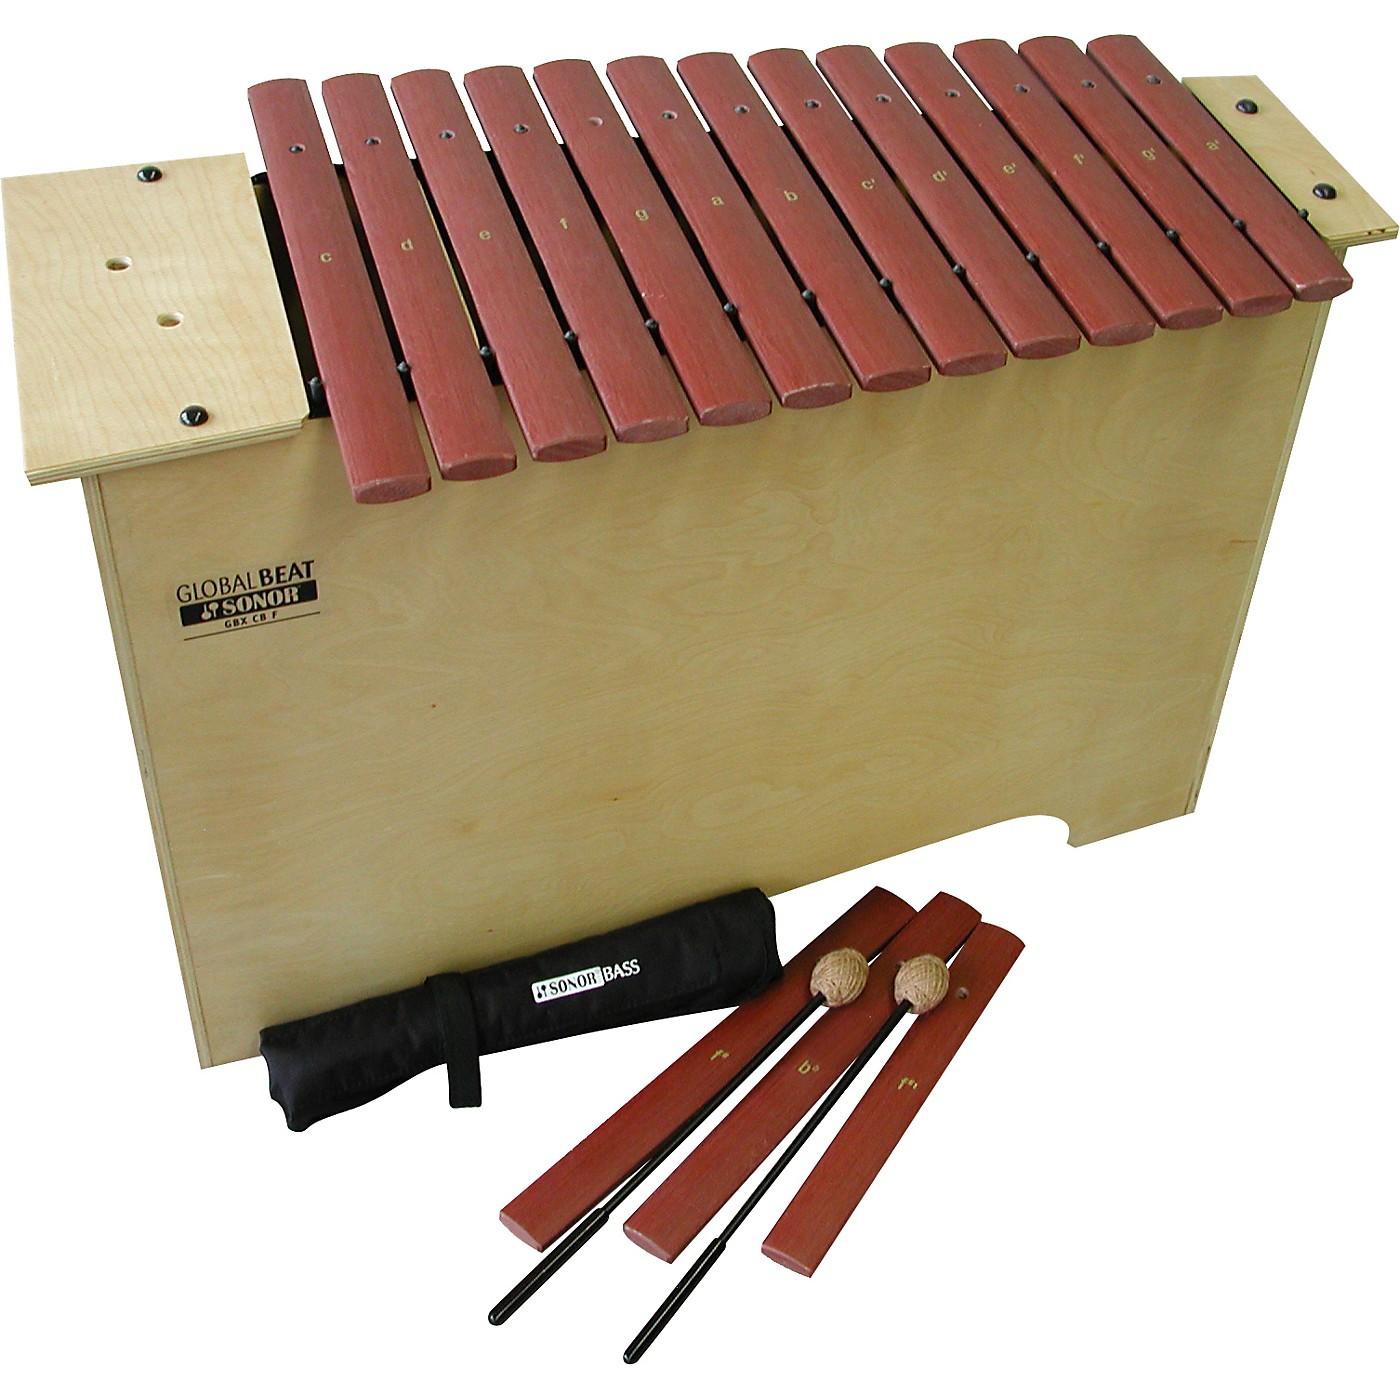 Sonor Orff Global Beat Deep Bass Xylophone with Fiberglass Bars thumbnail